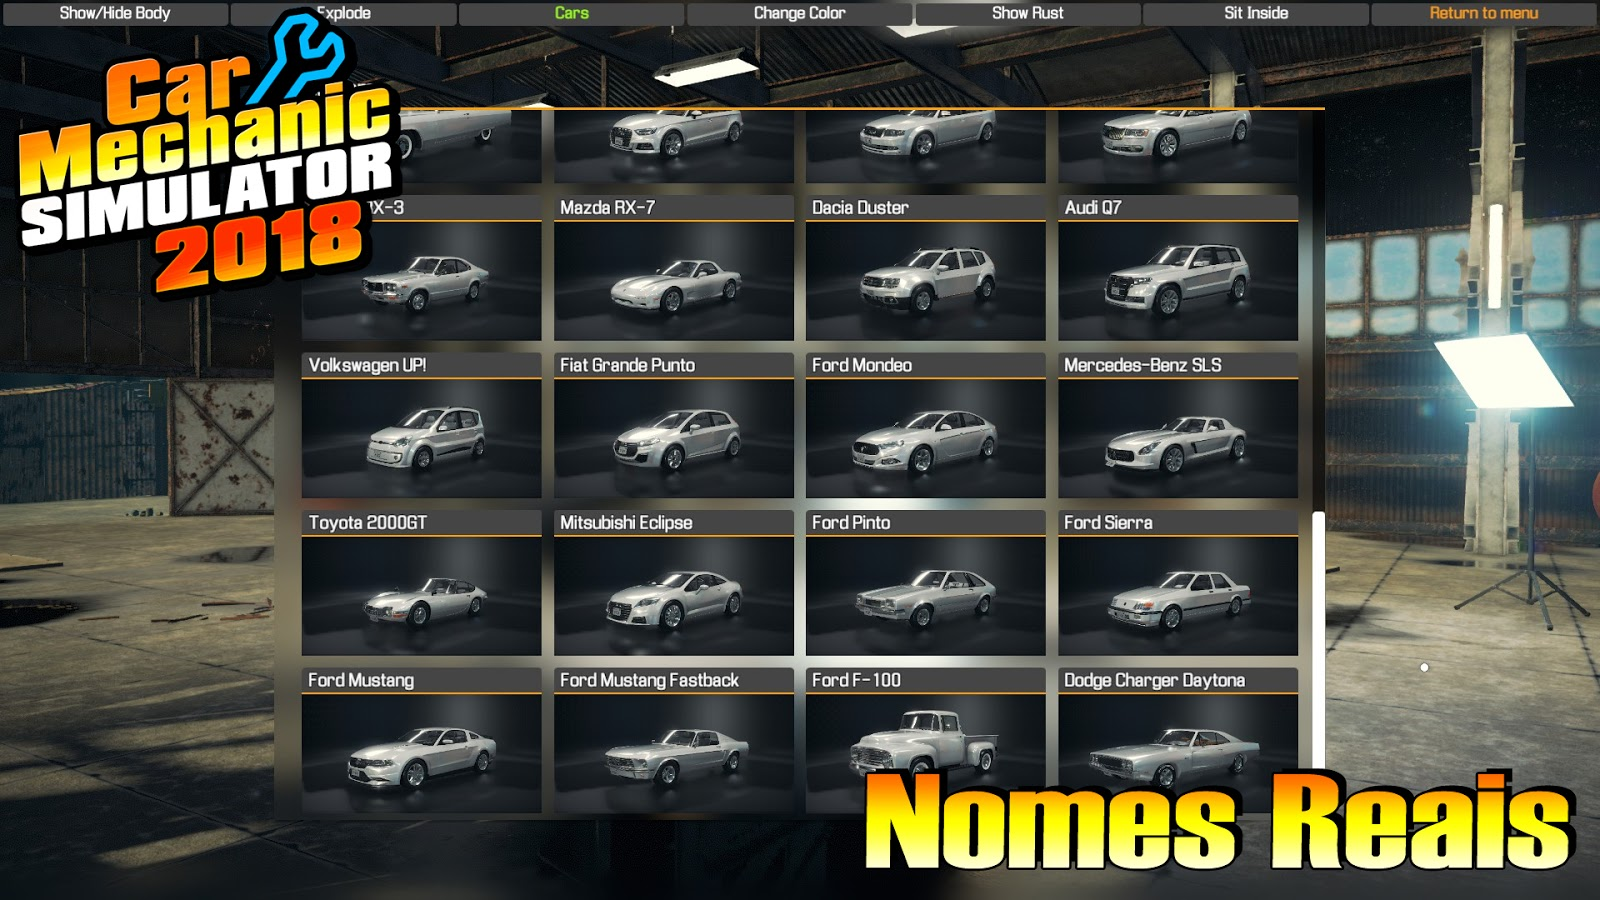 CMS18][Mod] Nomes reais dos carros | My Summer Car Brasil